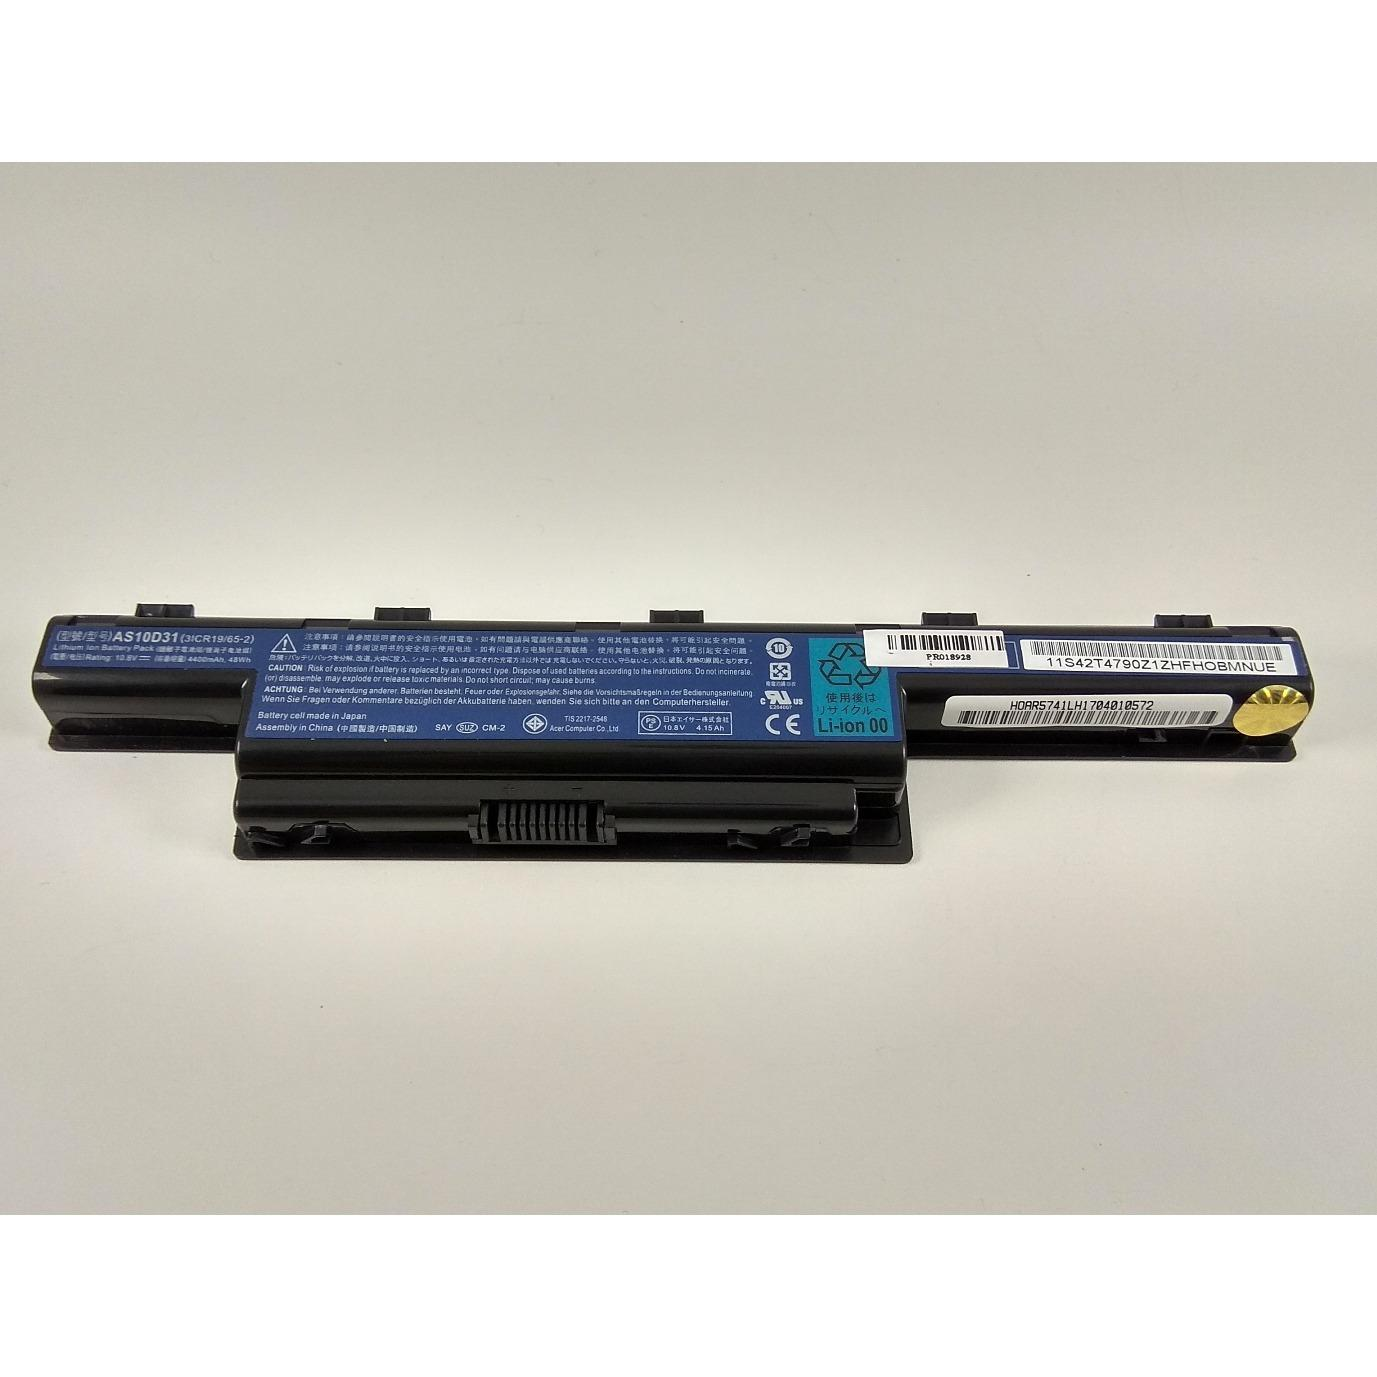 Acer Baterai Original Aspire 4551g 4741 4741g 4741zg 4771g 5740g Battery 4349g 4750 4738z 4738 4739g 4739 E1 471 5750 As10d51 As10d53 As10d31 As10d3e As10d41 As10d61 As10d71 As10d81 As10d75 Ori Laptop 5741g E 1431